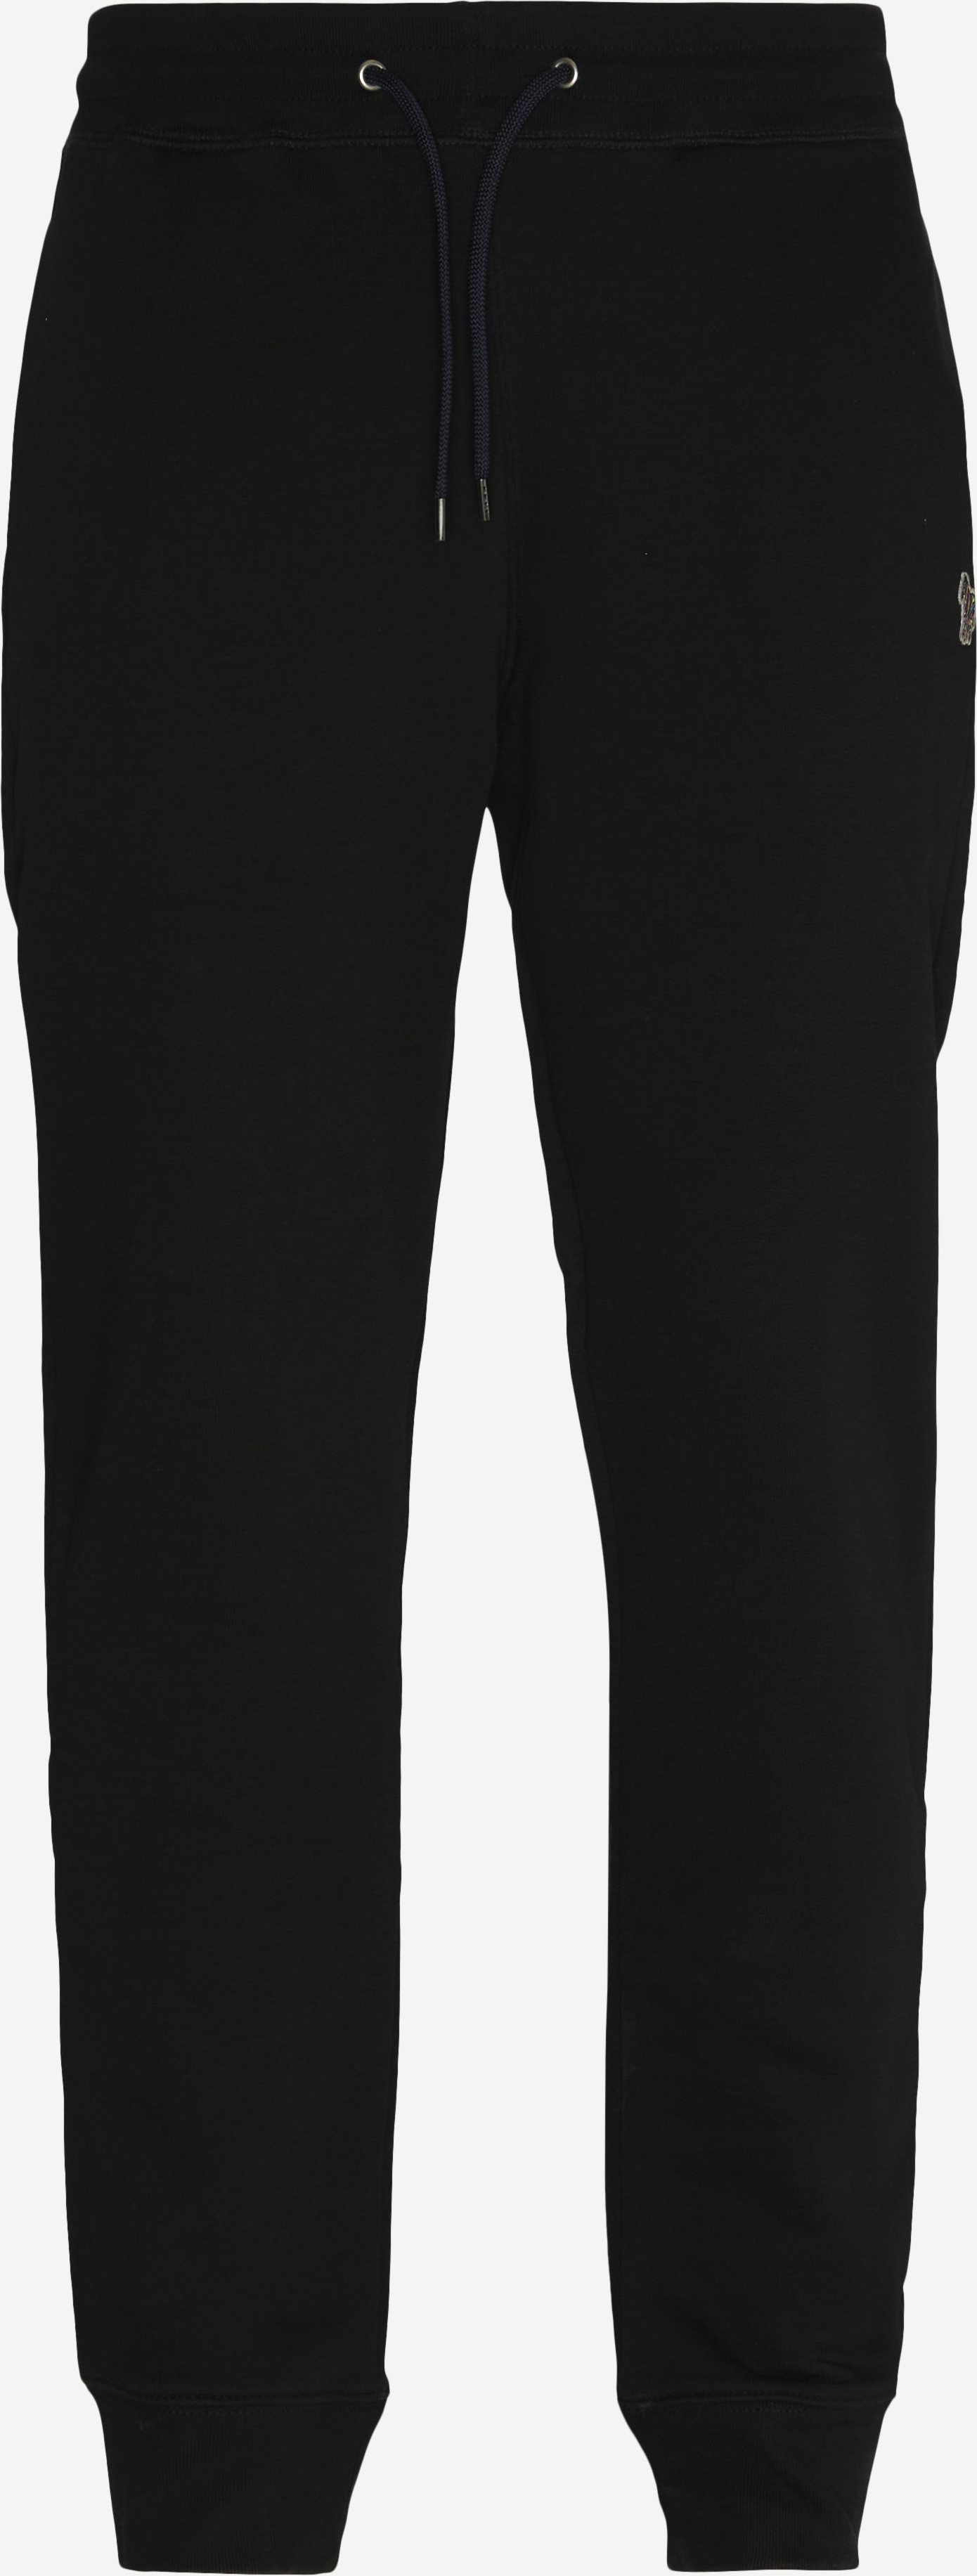 Byxor - Regular fit - Svart